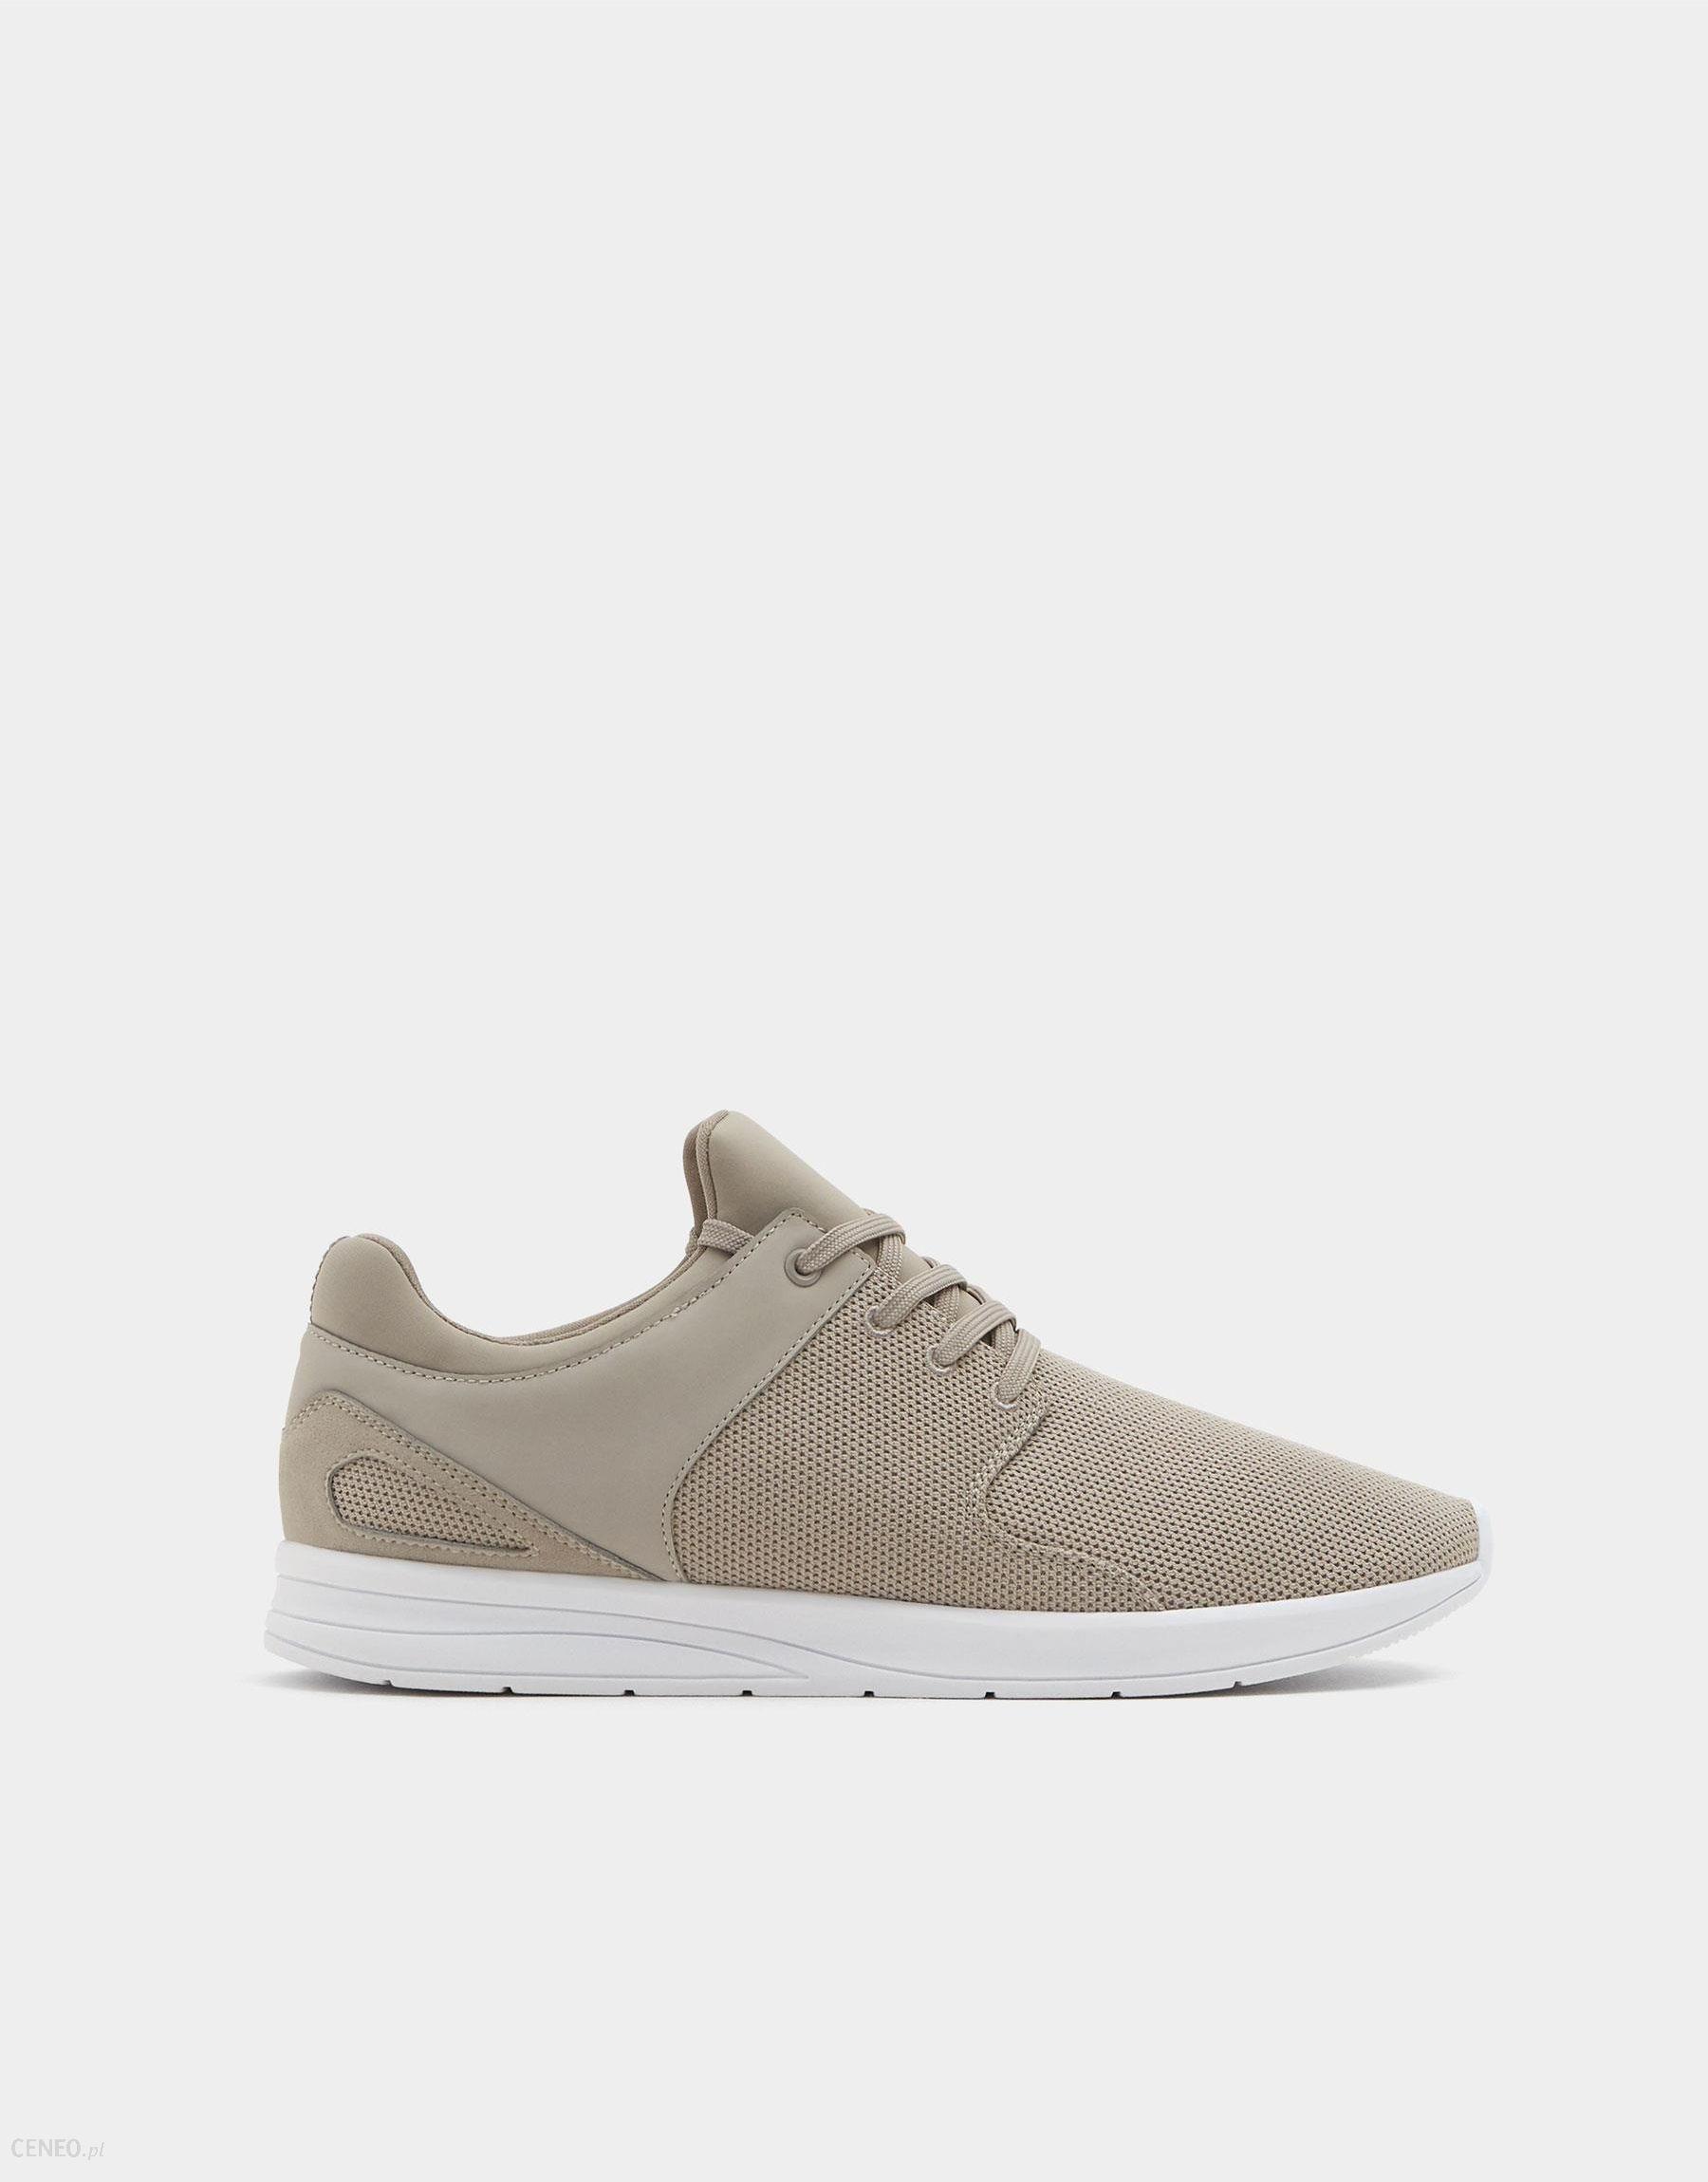 Nike Air Jordan Future 656503 305 Buty Męskie 24H Ceny i opinie Ceneo.pl